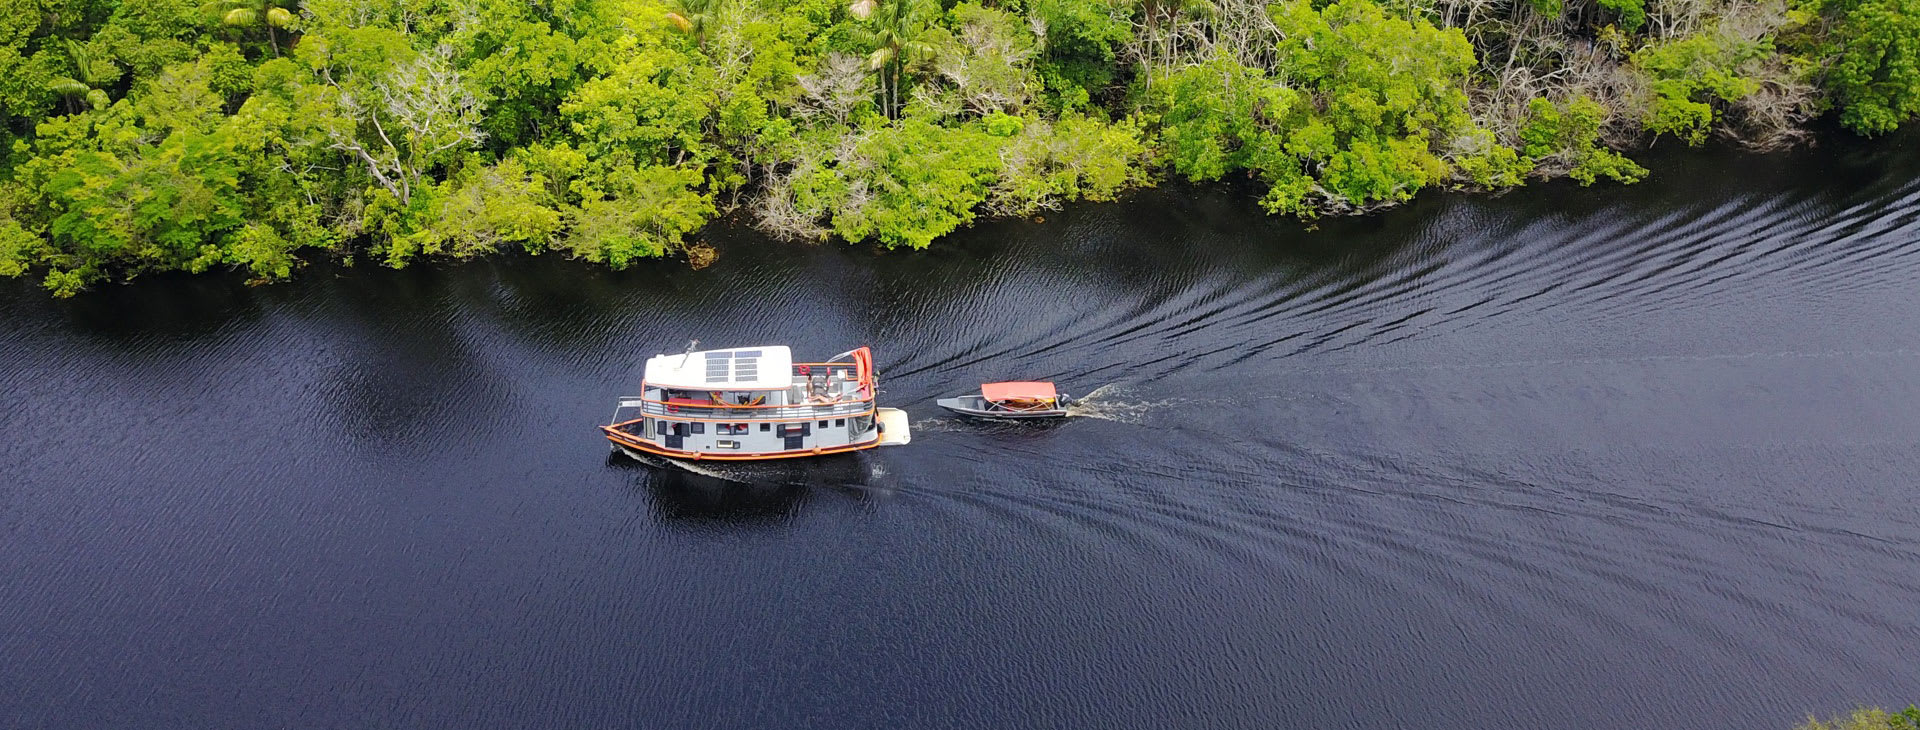 Small boat on the Brazilian Amazon